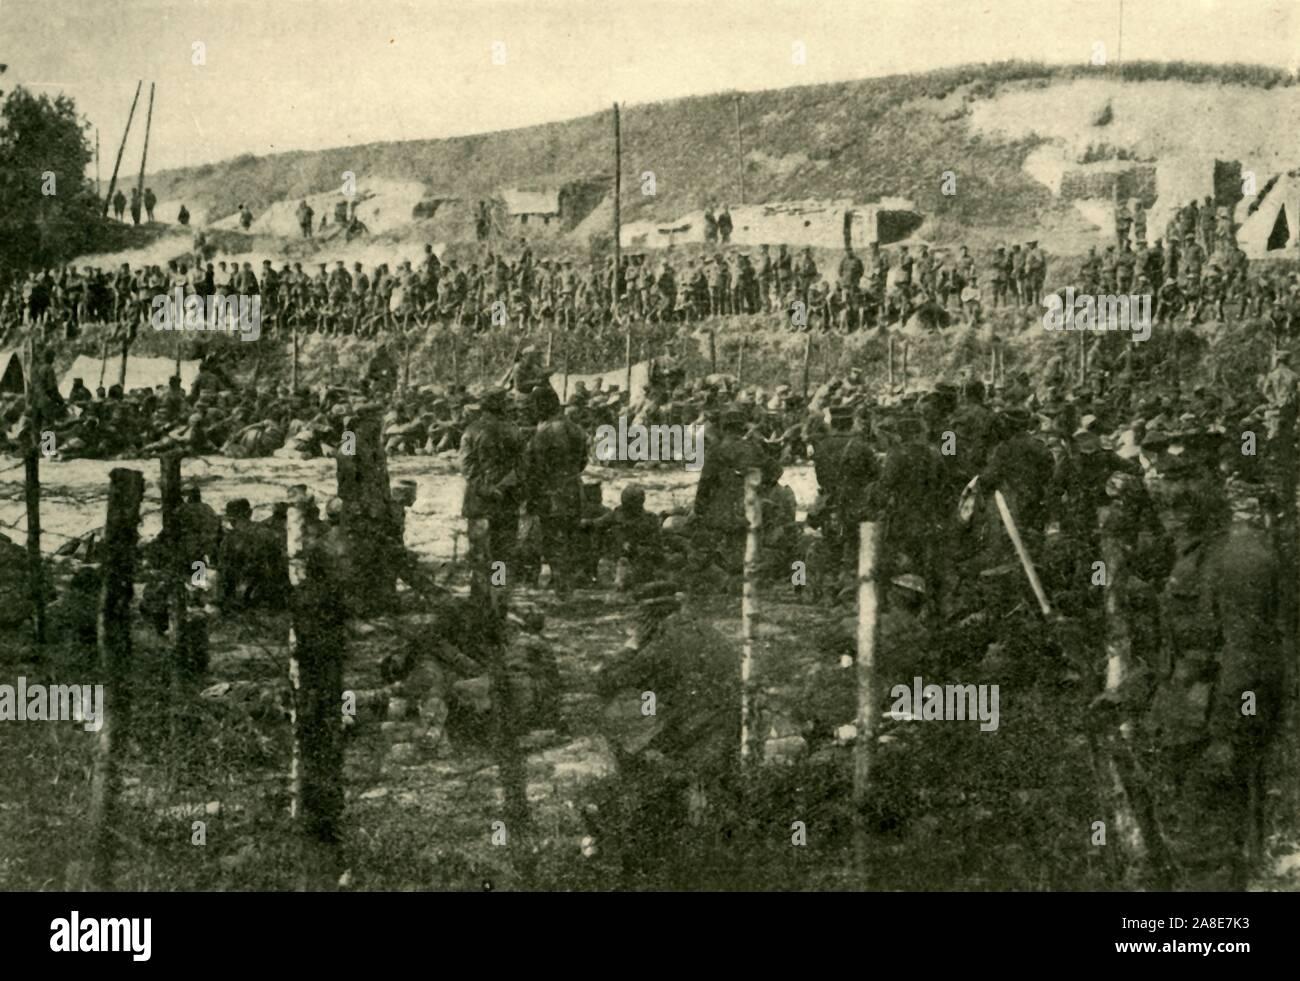 WWII B/&W Photo US Prisoners of War at Battle of the Bulge  WW2 World War// 1165